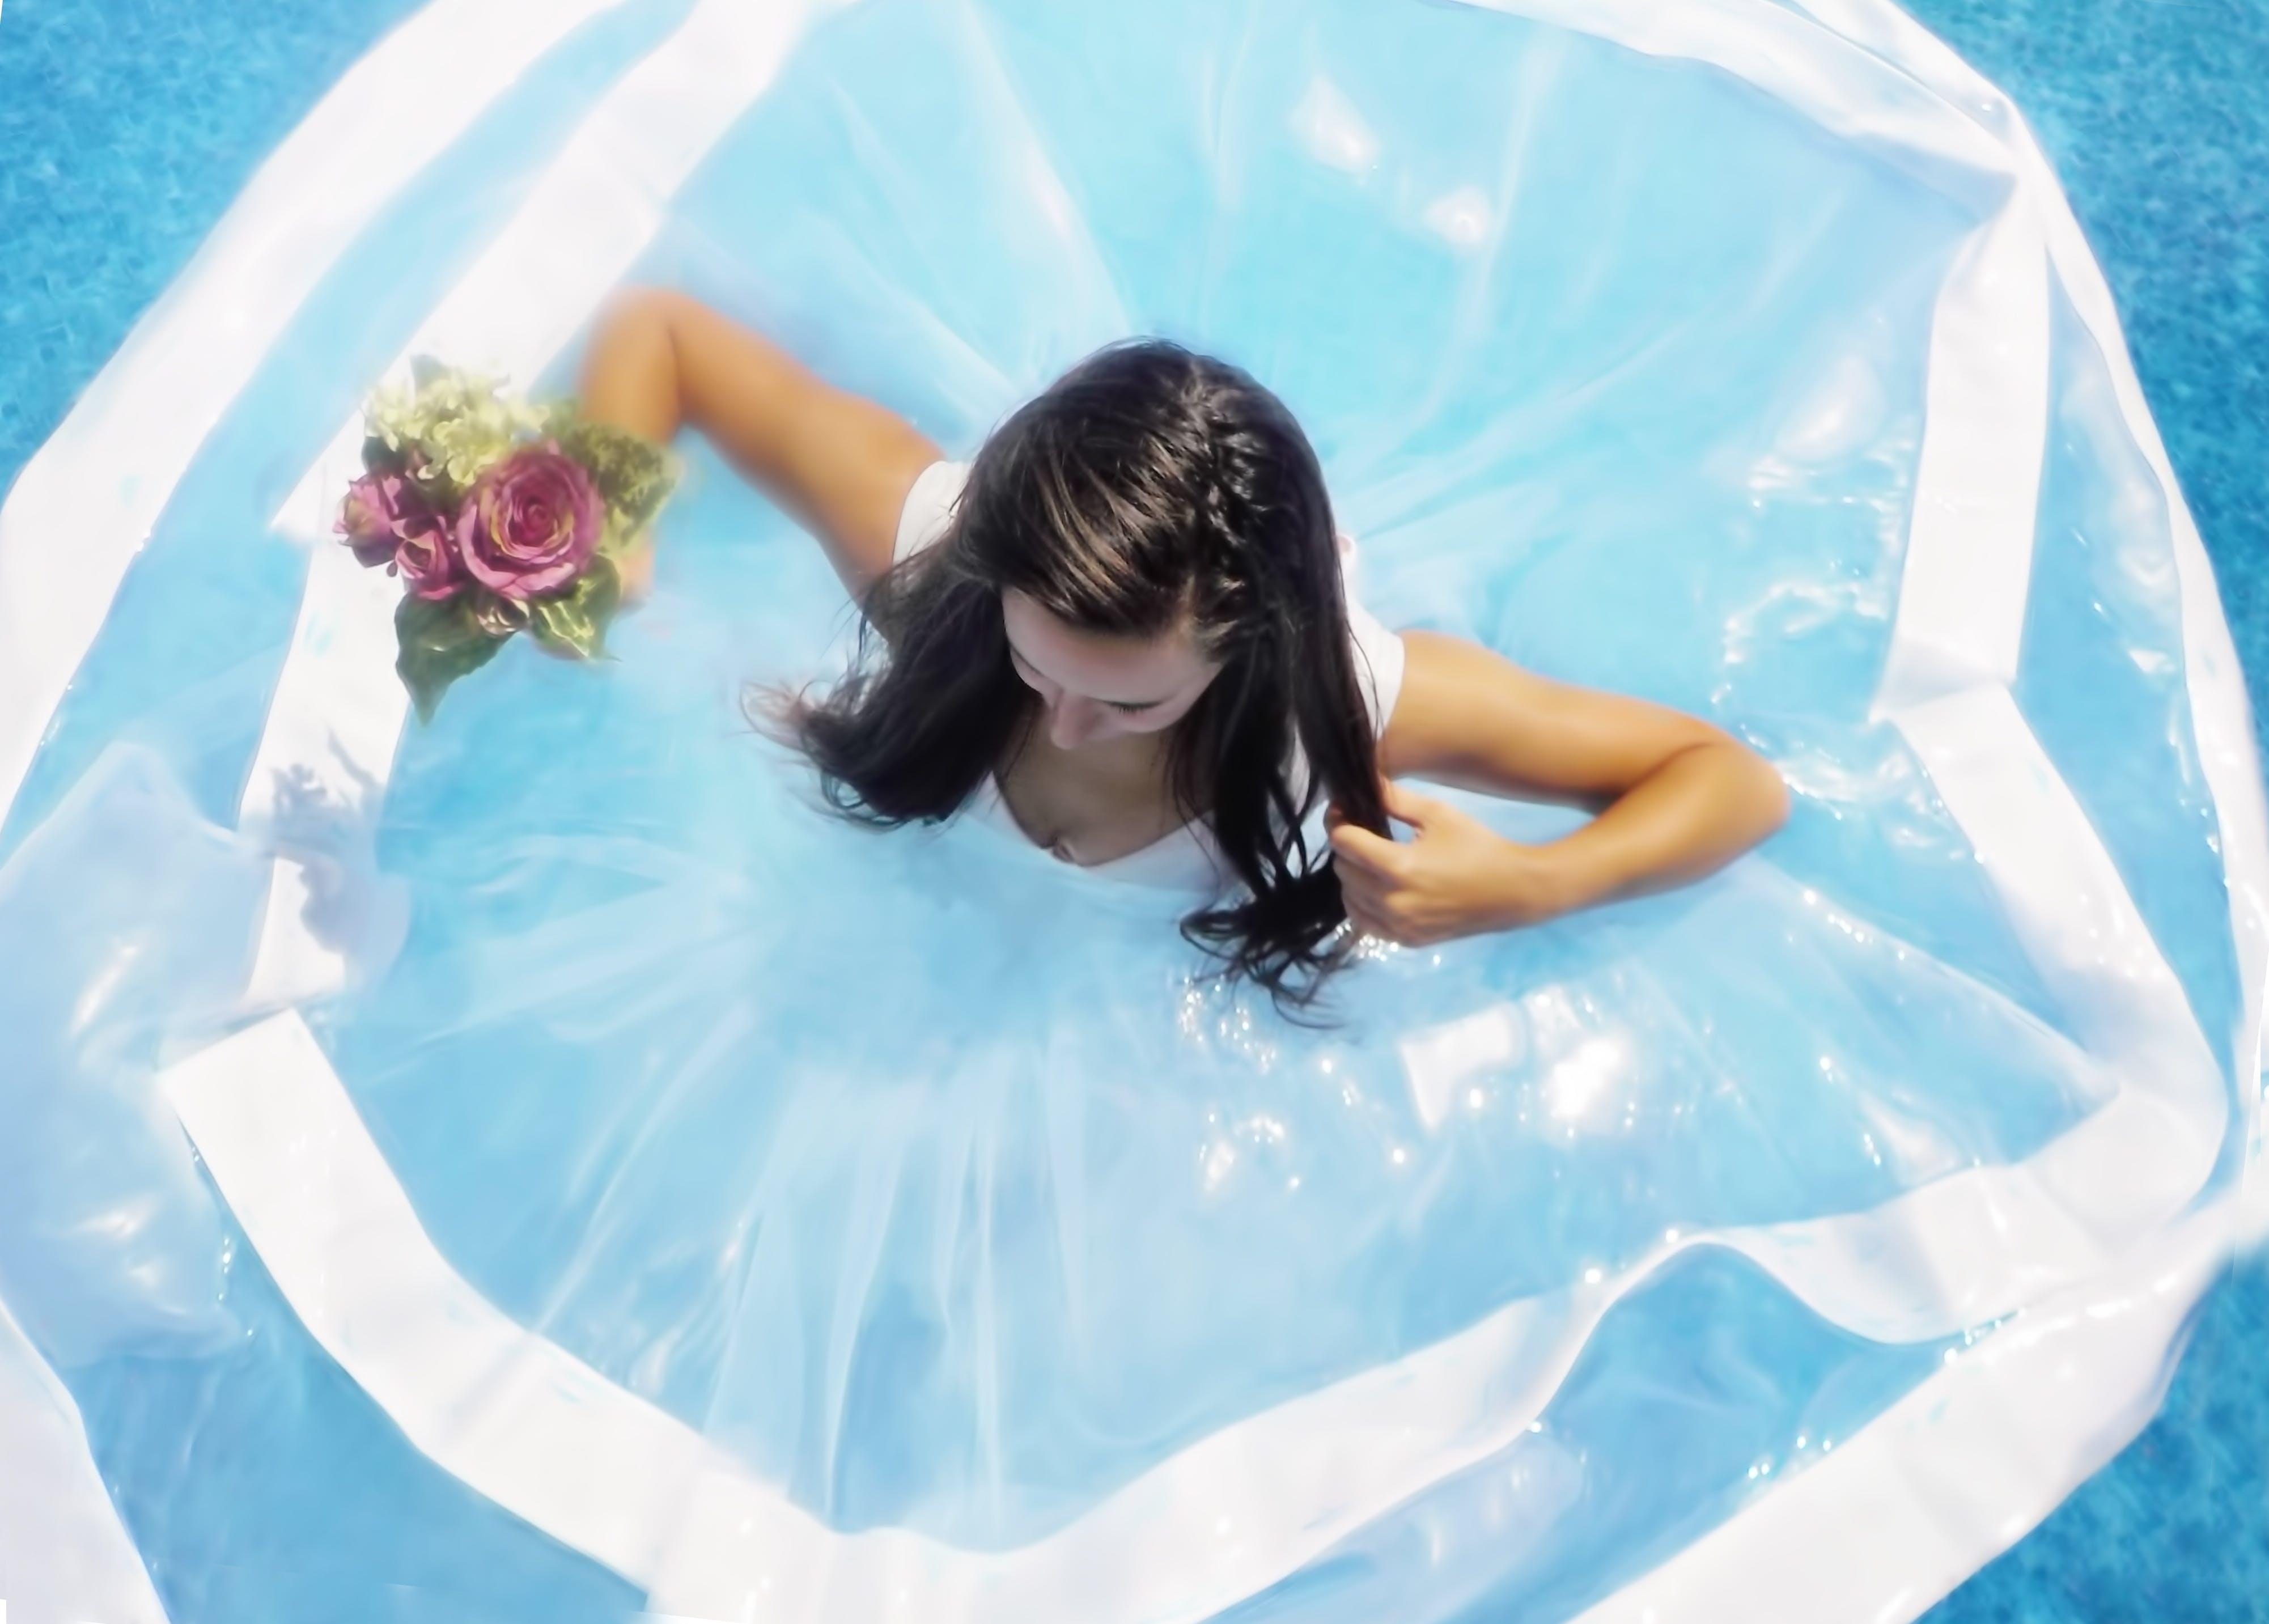 Free stock photo of woman, water, summer, dress